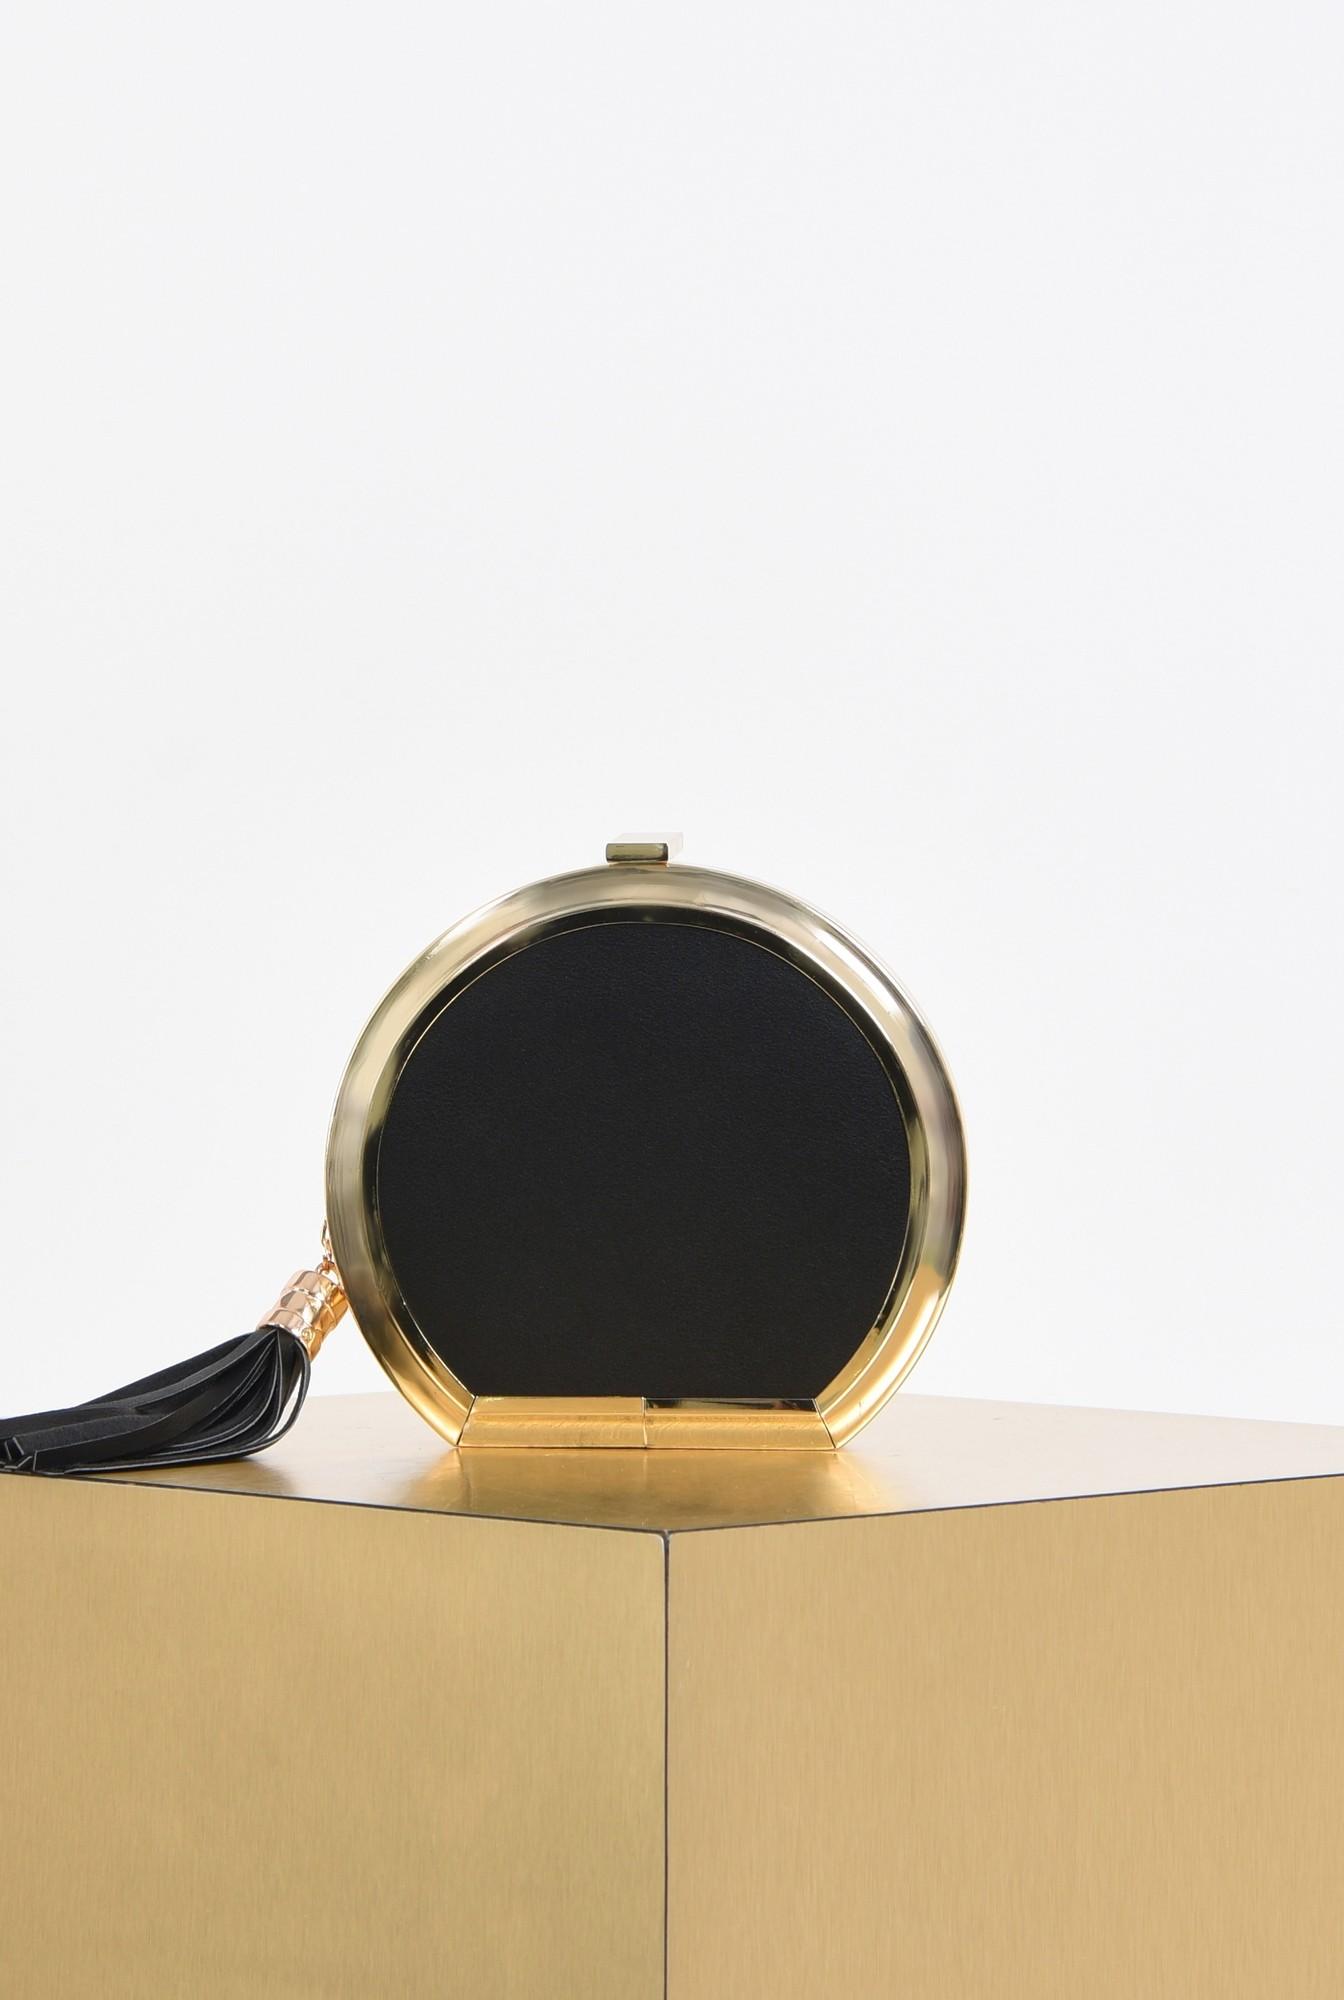 0 - plic elegant, negru, caseta, ciucure, lant auriu